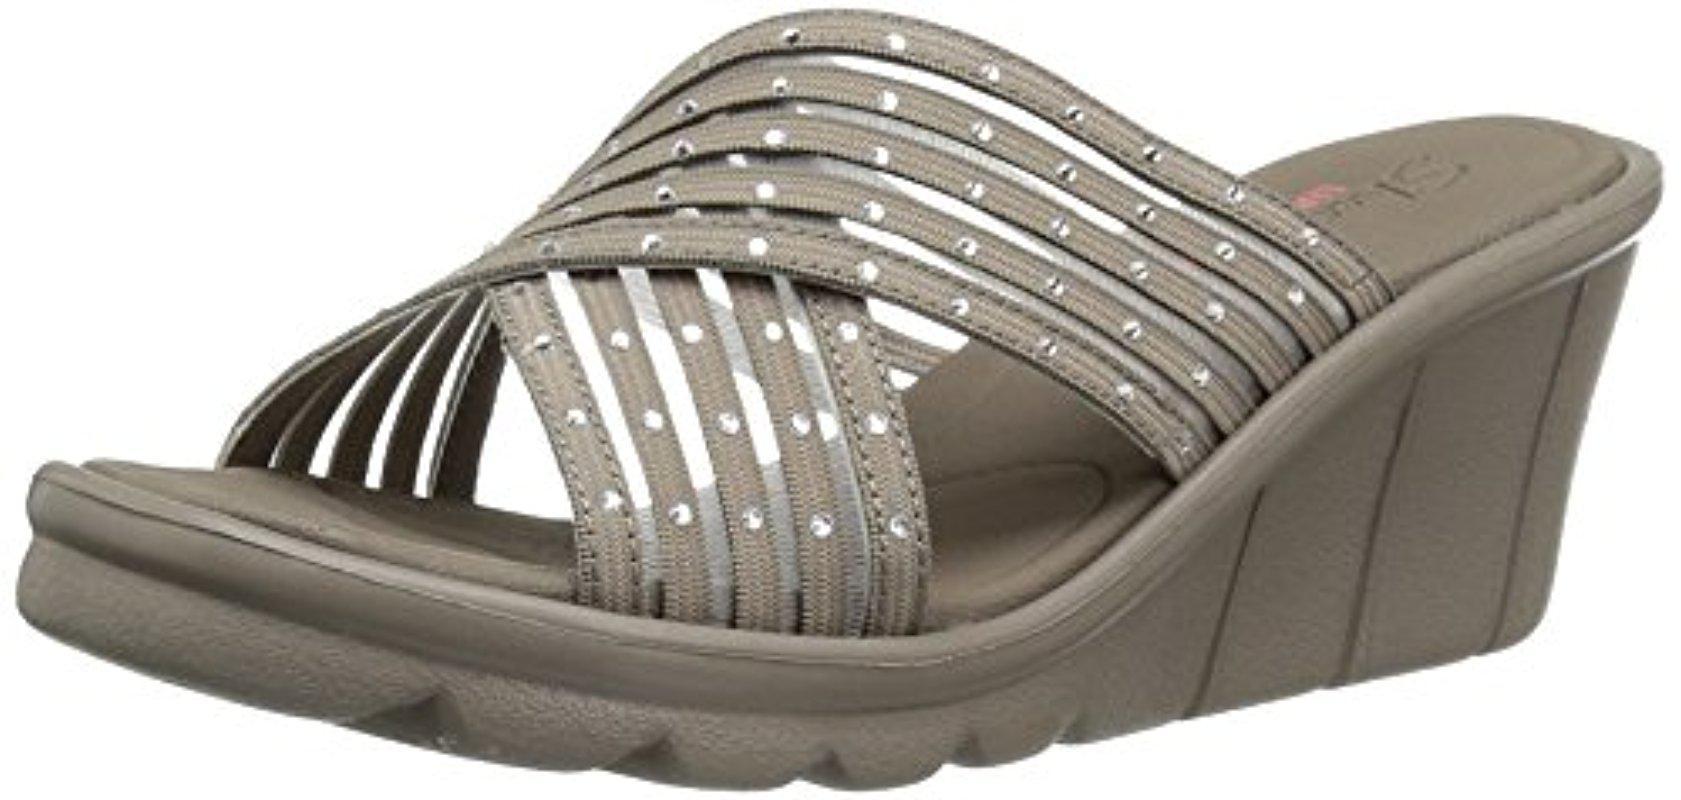 304082afeb55 Lyst - Skechers Cali Promenade Easy Go Wedge Sandal